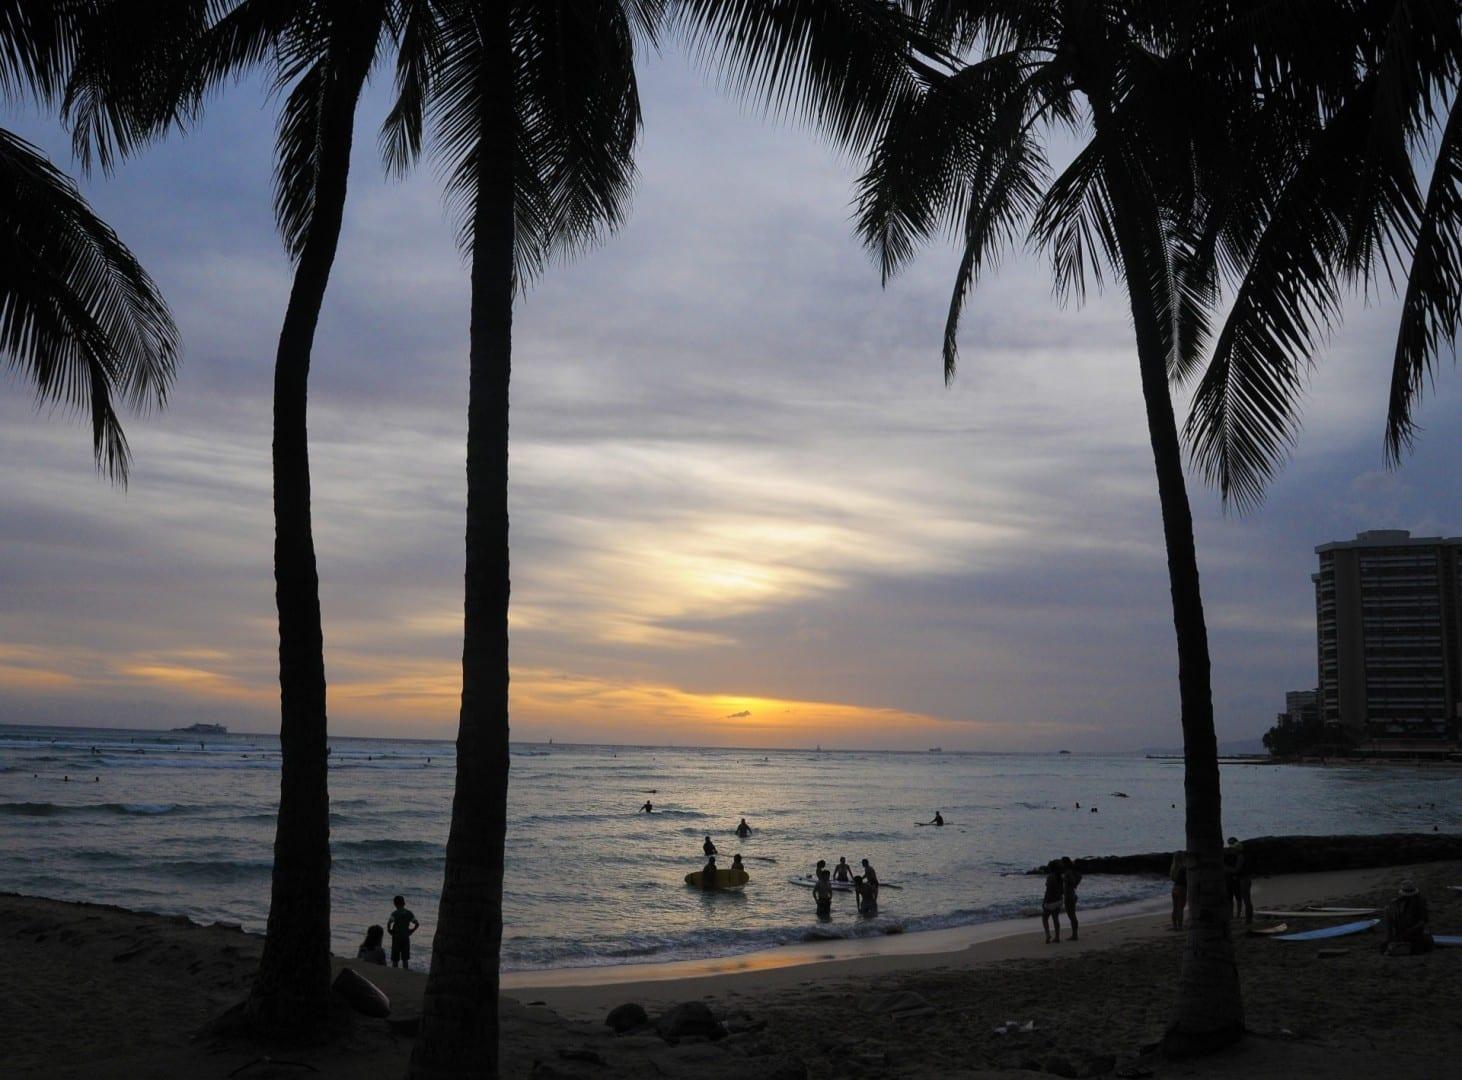 Waikiki-Oahu-sunset-Janine-Sprout Oahu HI Estados Unidos